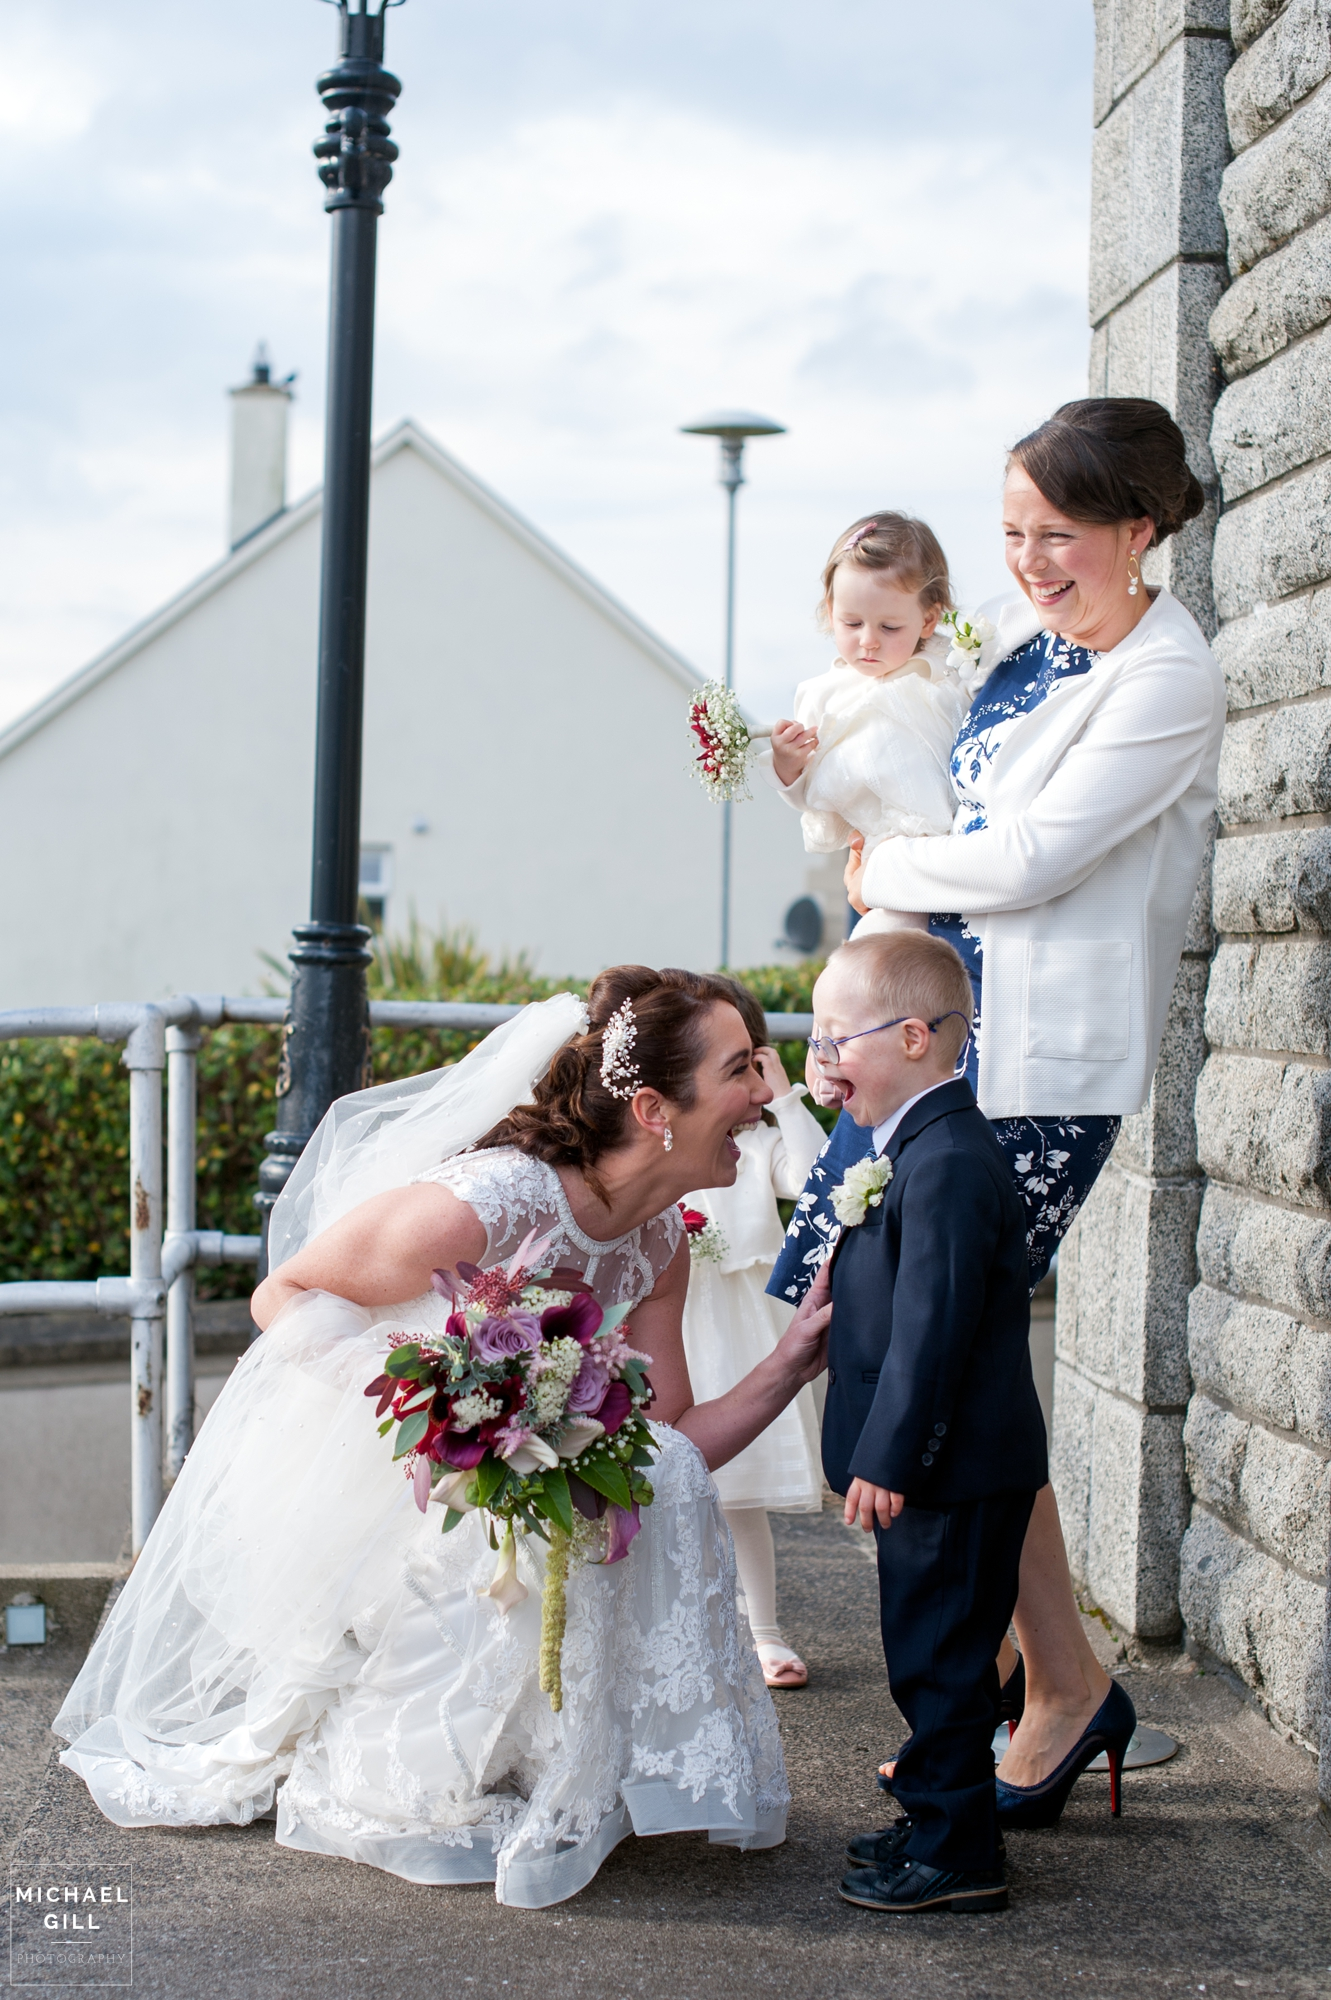 Michael_Gill_Photography_Kinnego_Redcastle_Hotel_Wedding4.jpg